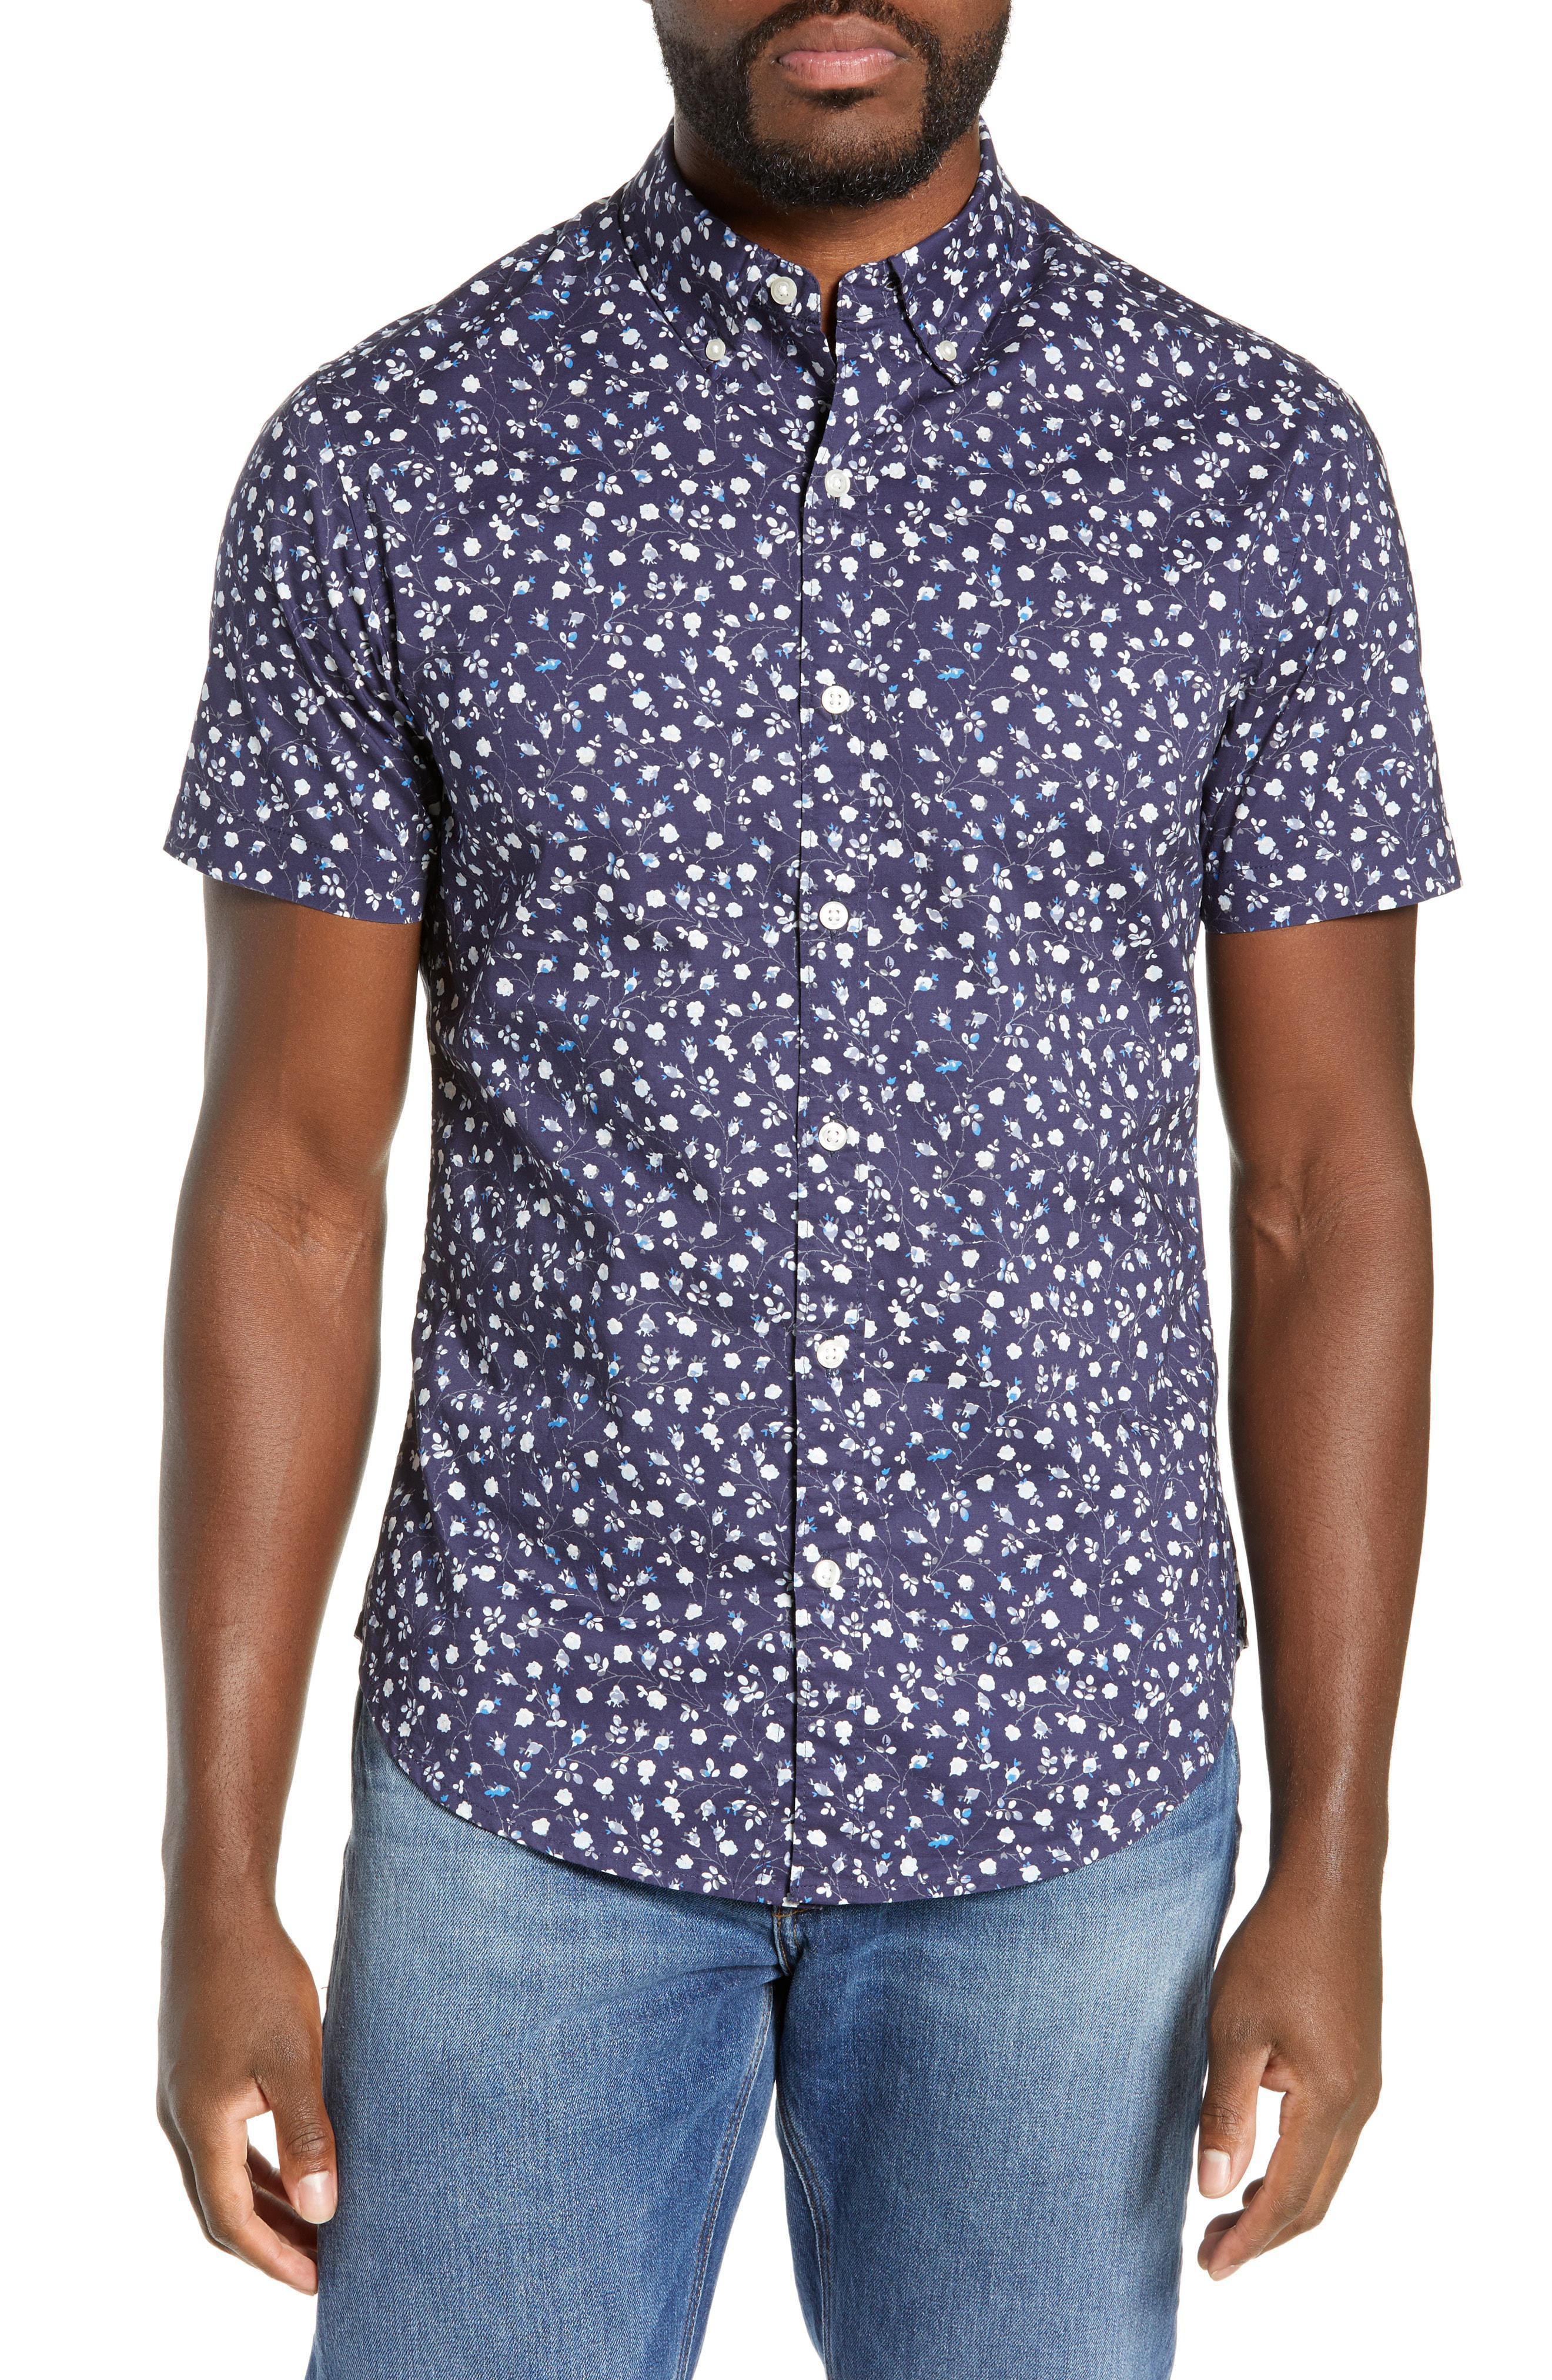 Communication on this topic: Dolce Gabbana Sport Print Riviera Shirt, dolce-gabbana-sport-print-riviera-shirt/